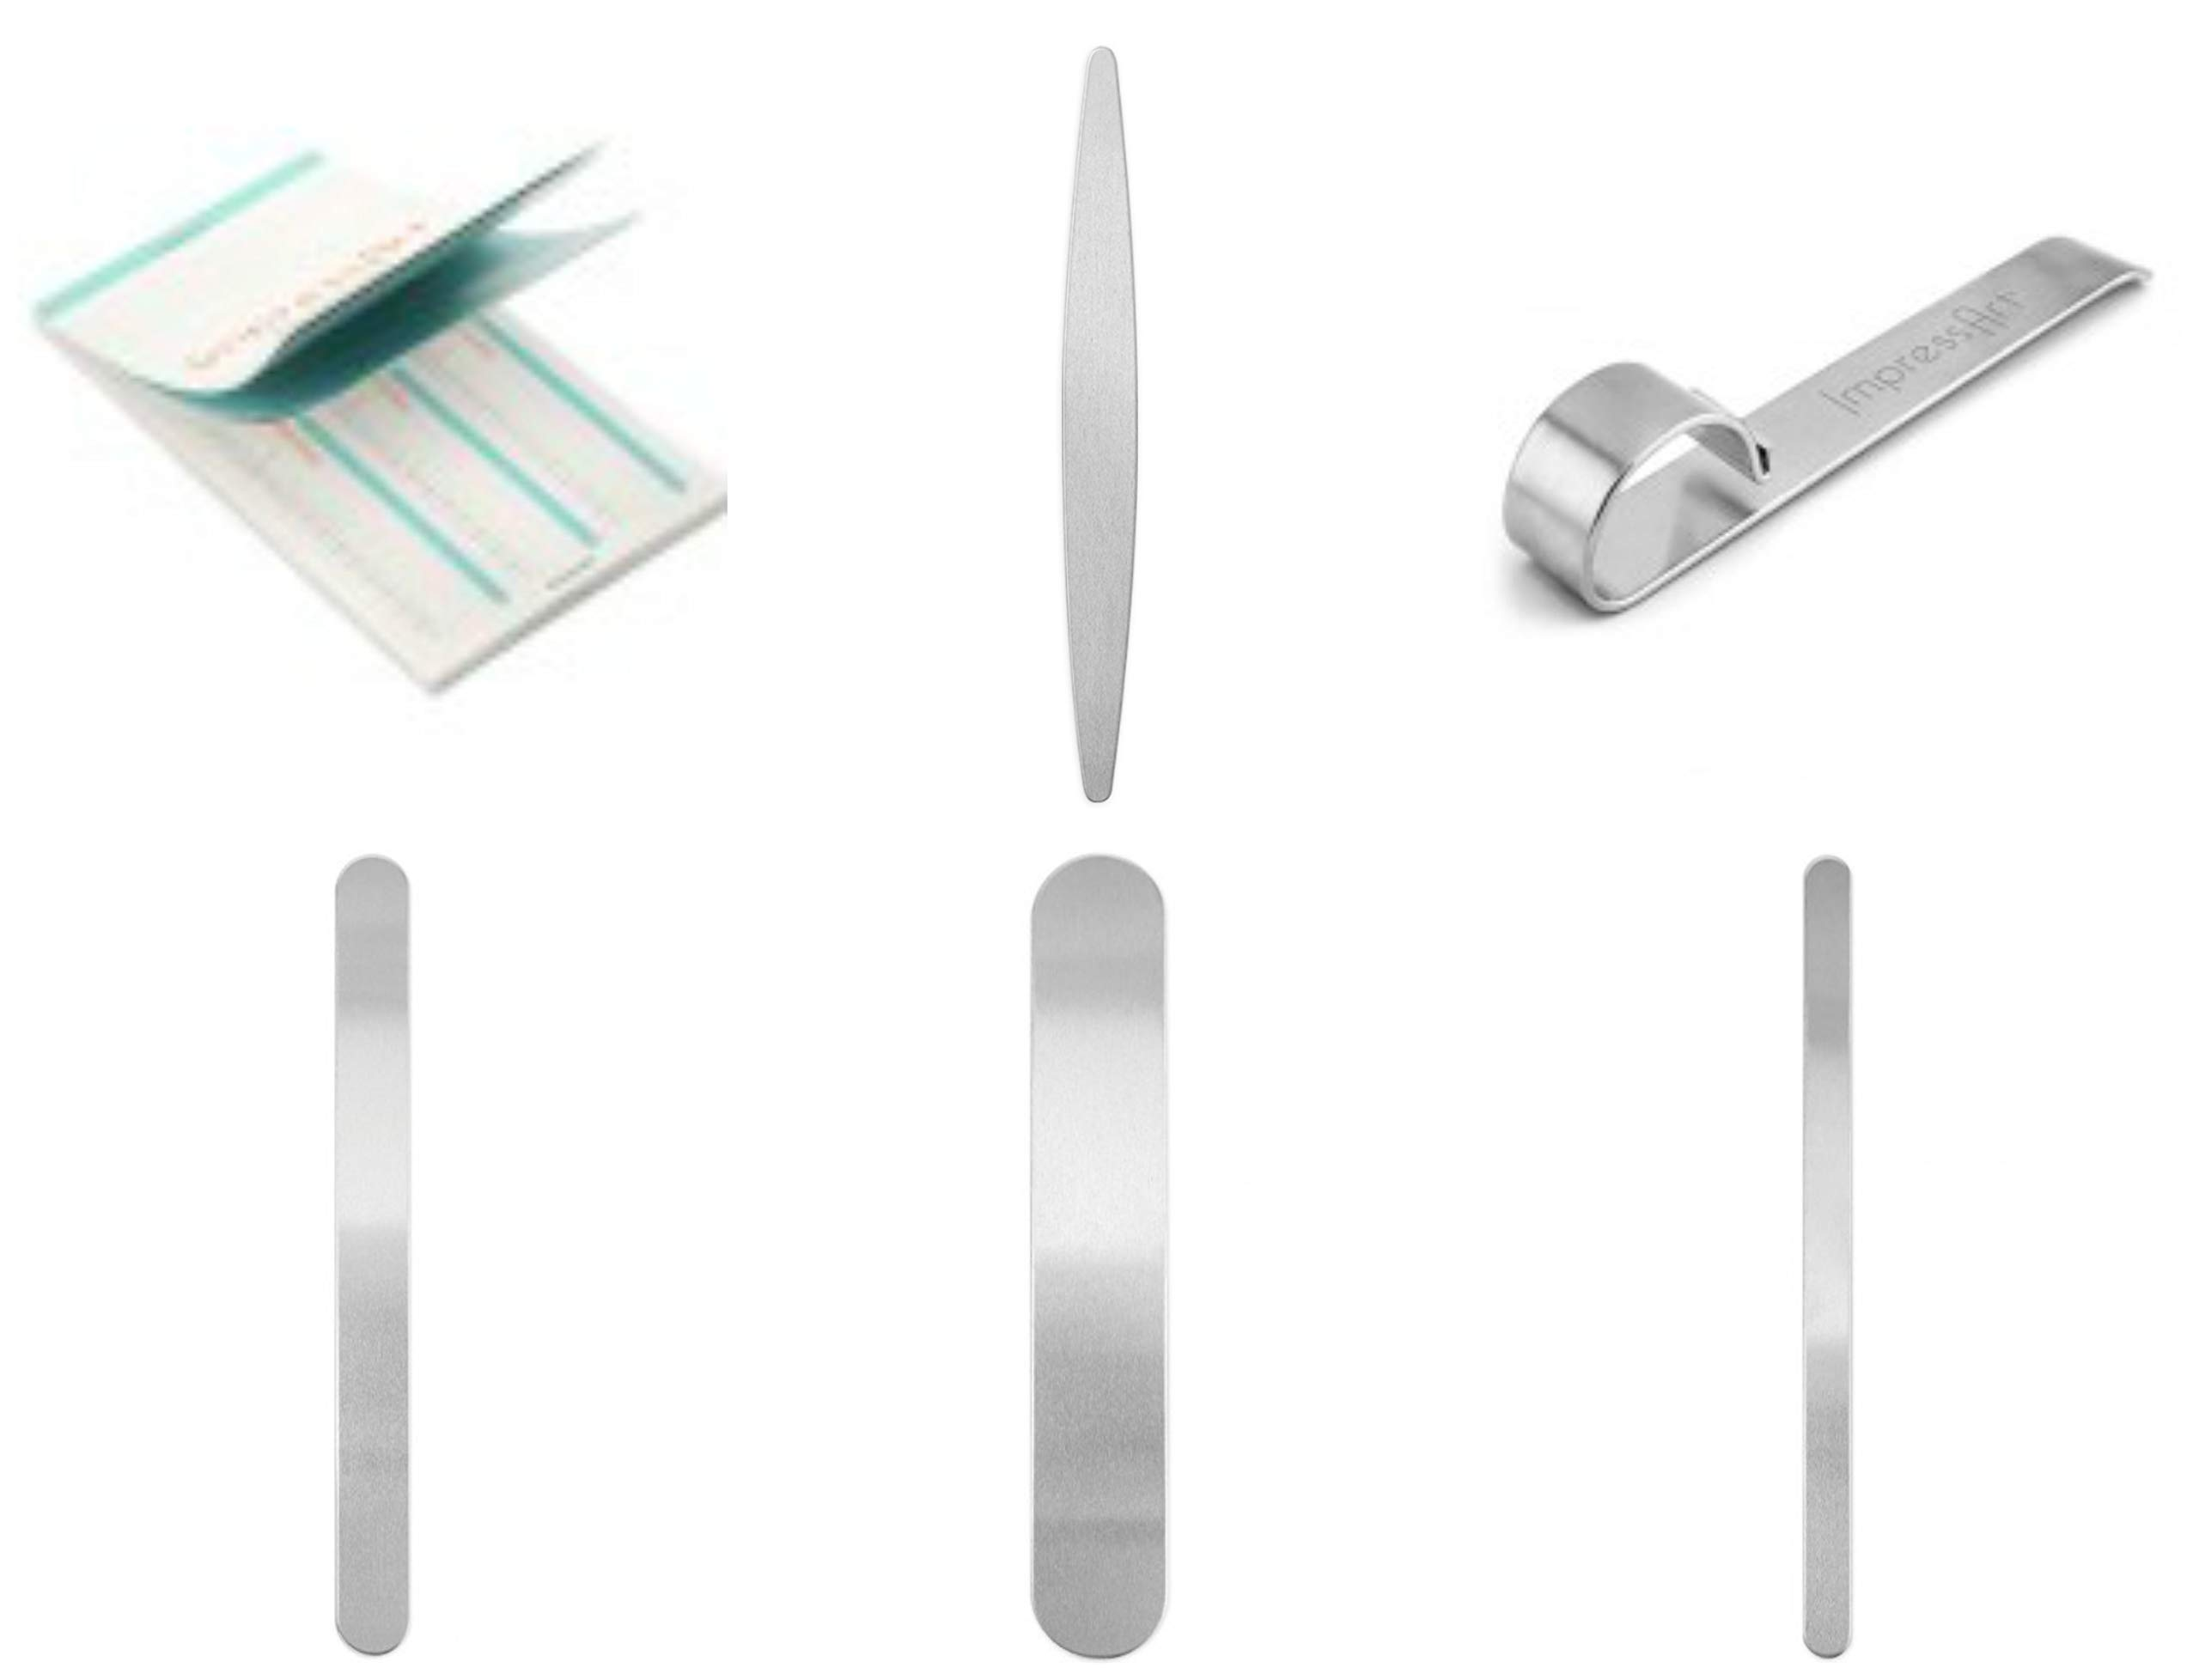 16 Impressart Bracelet Blanks Plus Bending Bar Plus Bracelet Stamping Guide, Free Priority Mail Shipping!-Impress Art Bracelet Stamping Kit, Great Gift! by ImpressArt